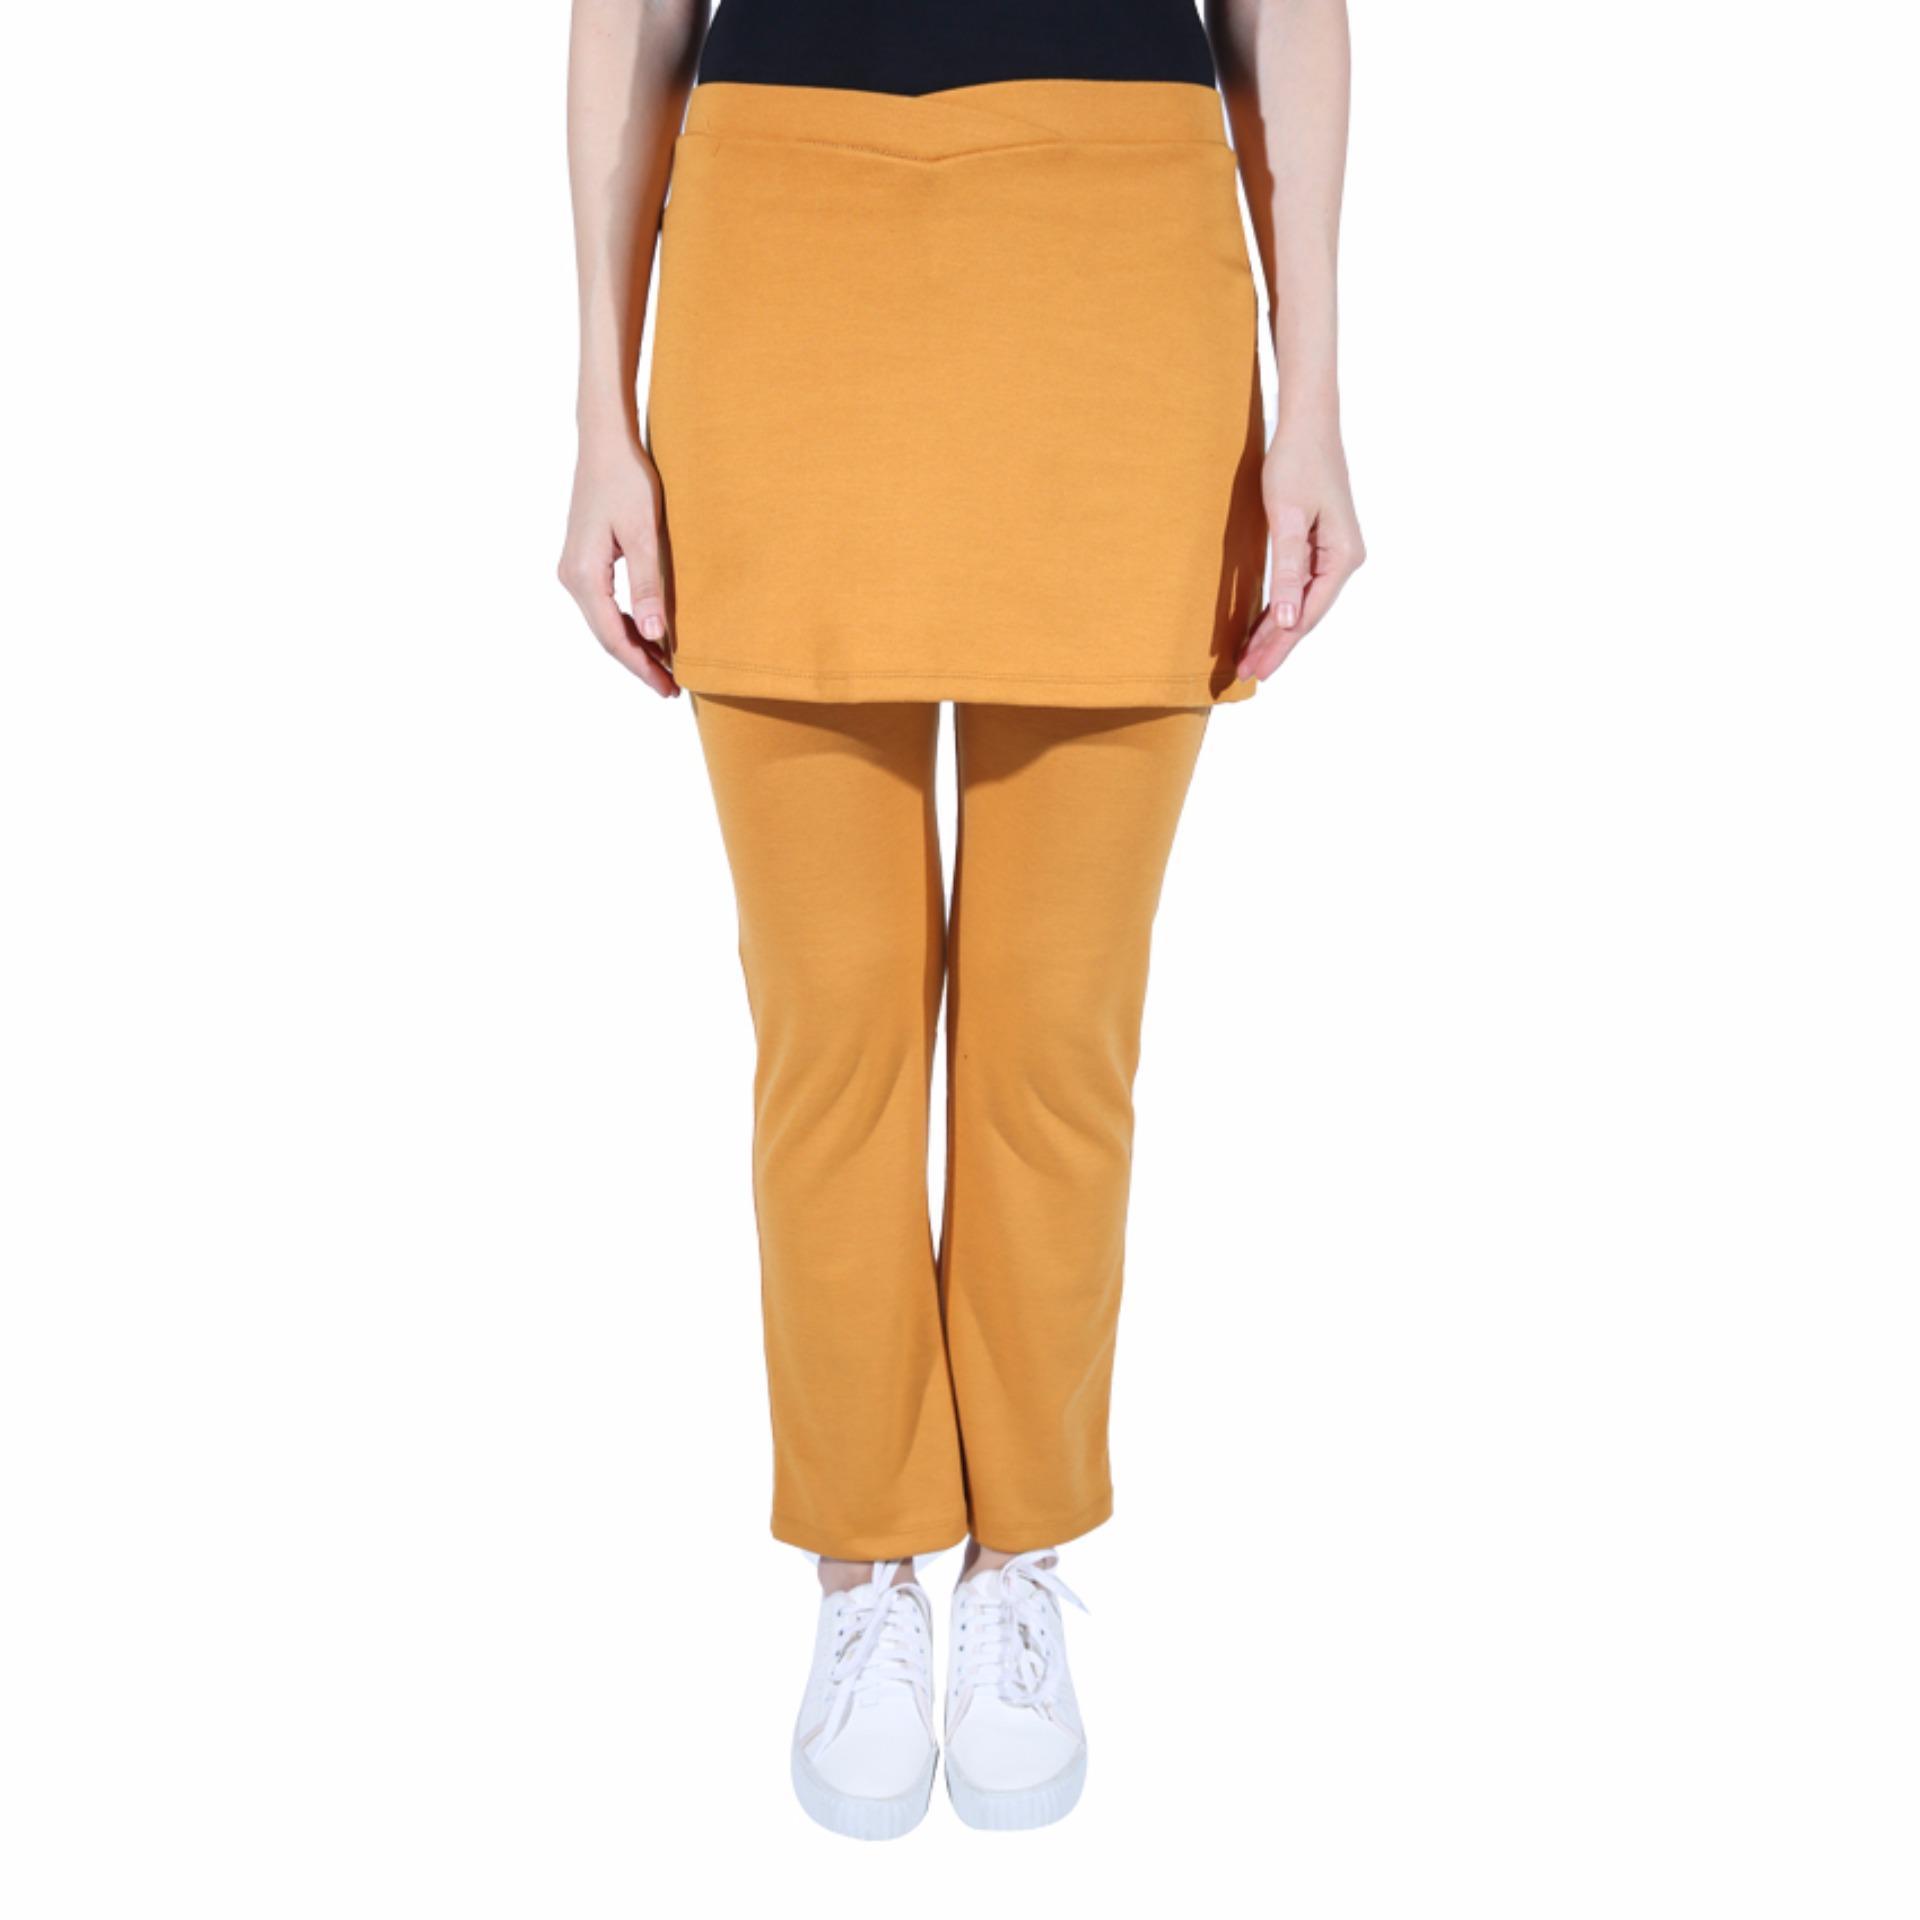 Jual Celana Senam Wanita Kuning Kunyit Online